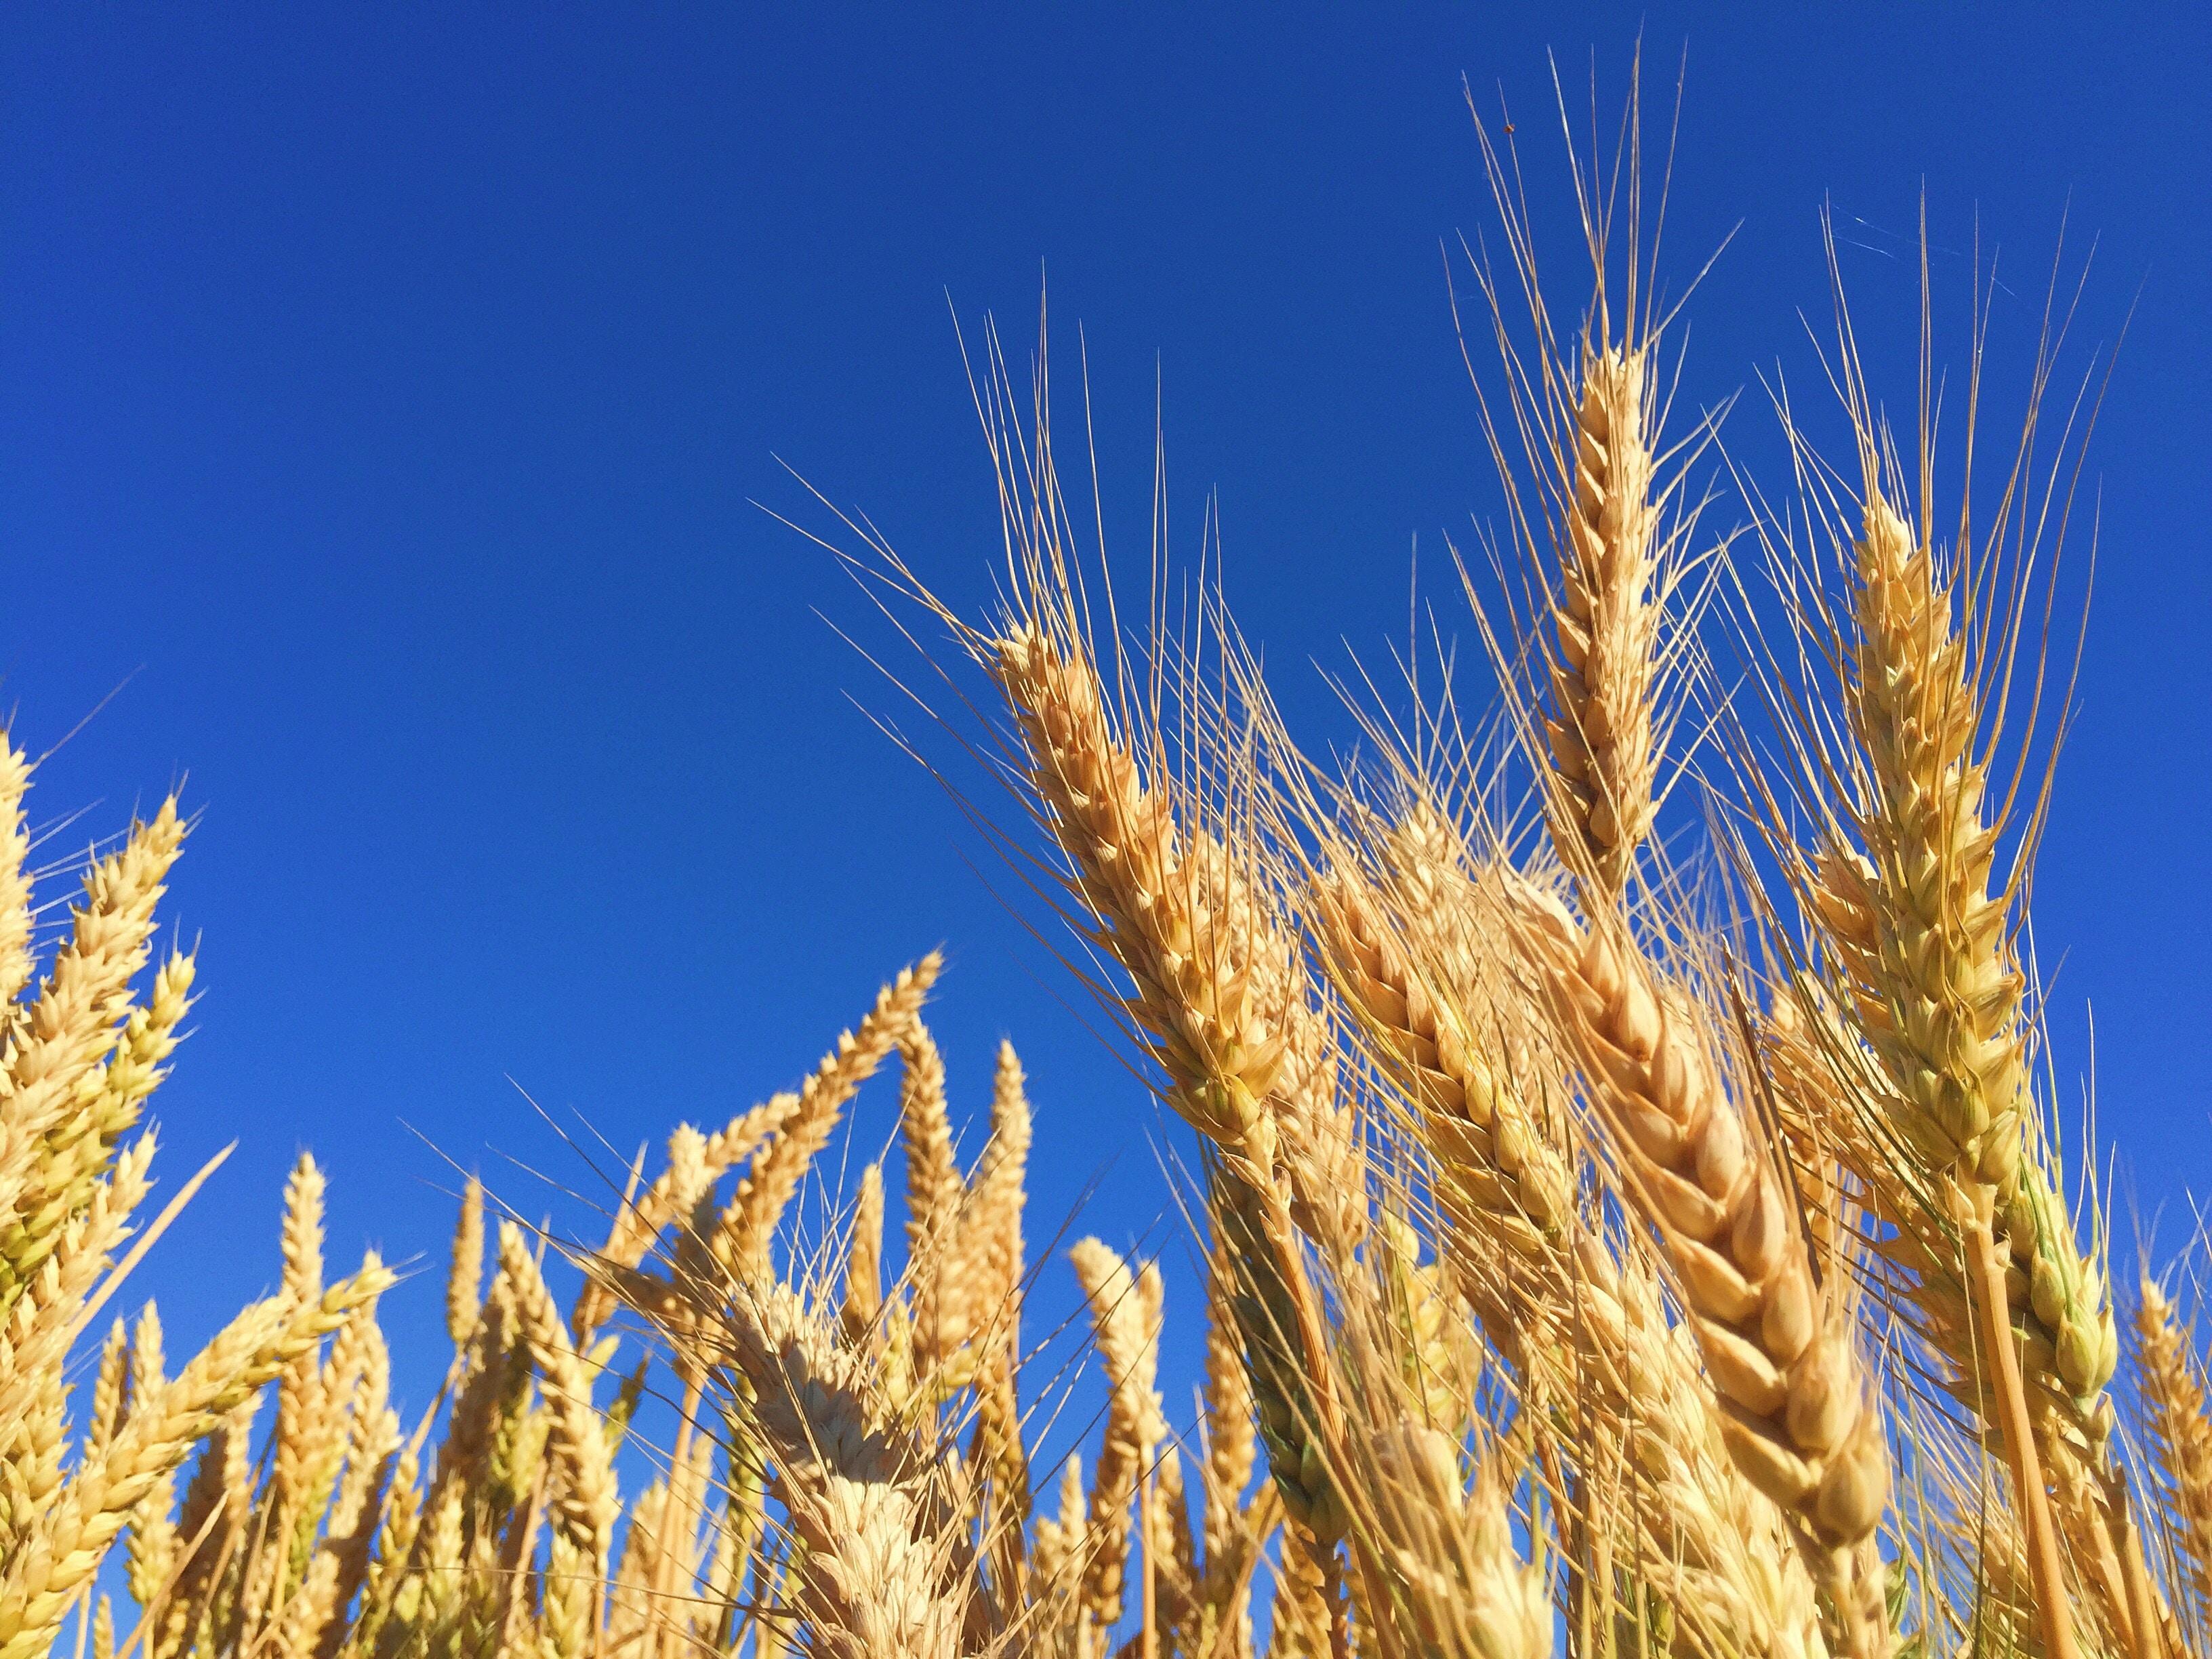 closeup photography of brown wheats